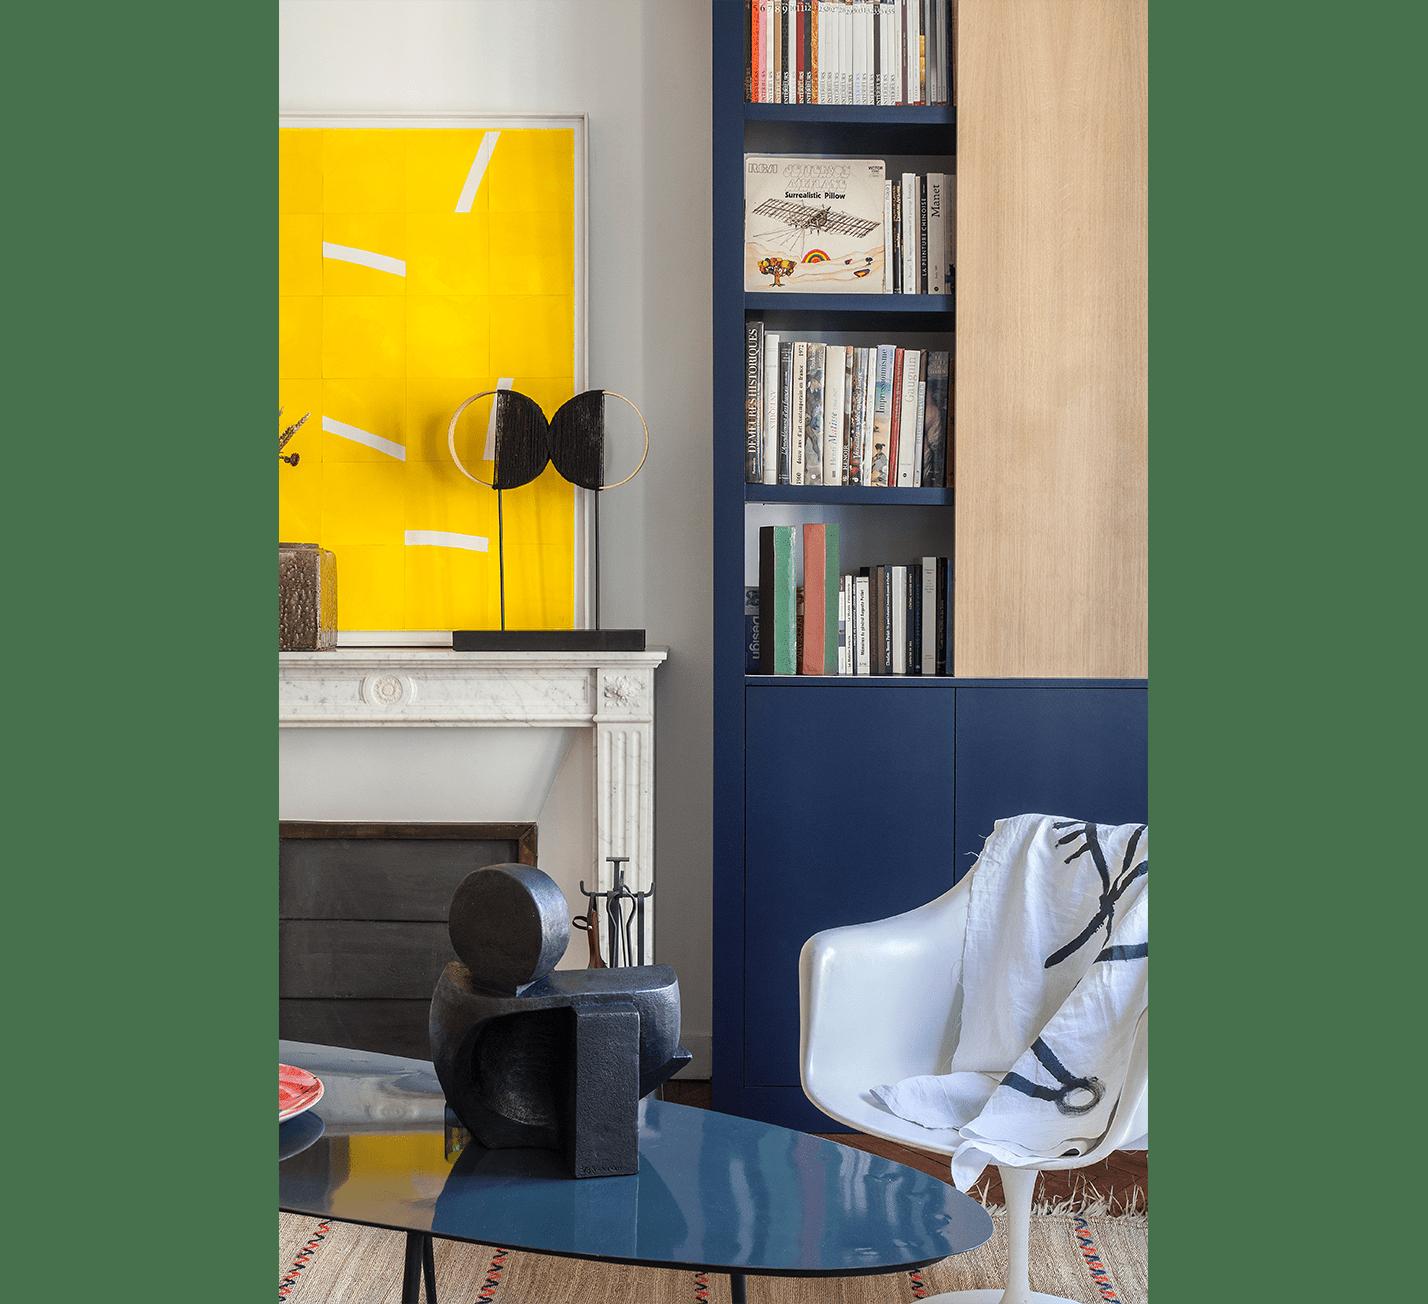 Projet-Alfred-Atelier-Steve-Pauline-Borgia-Architecture-interieur-04-min-1